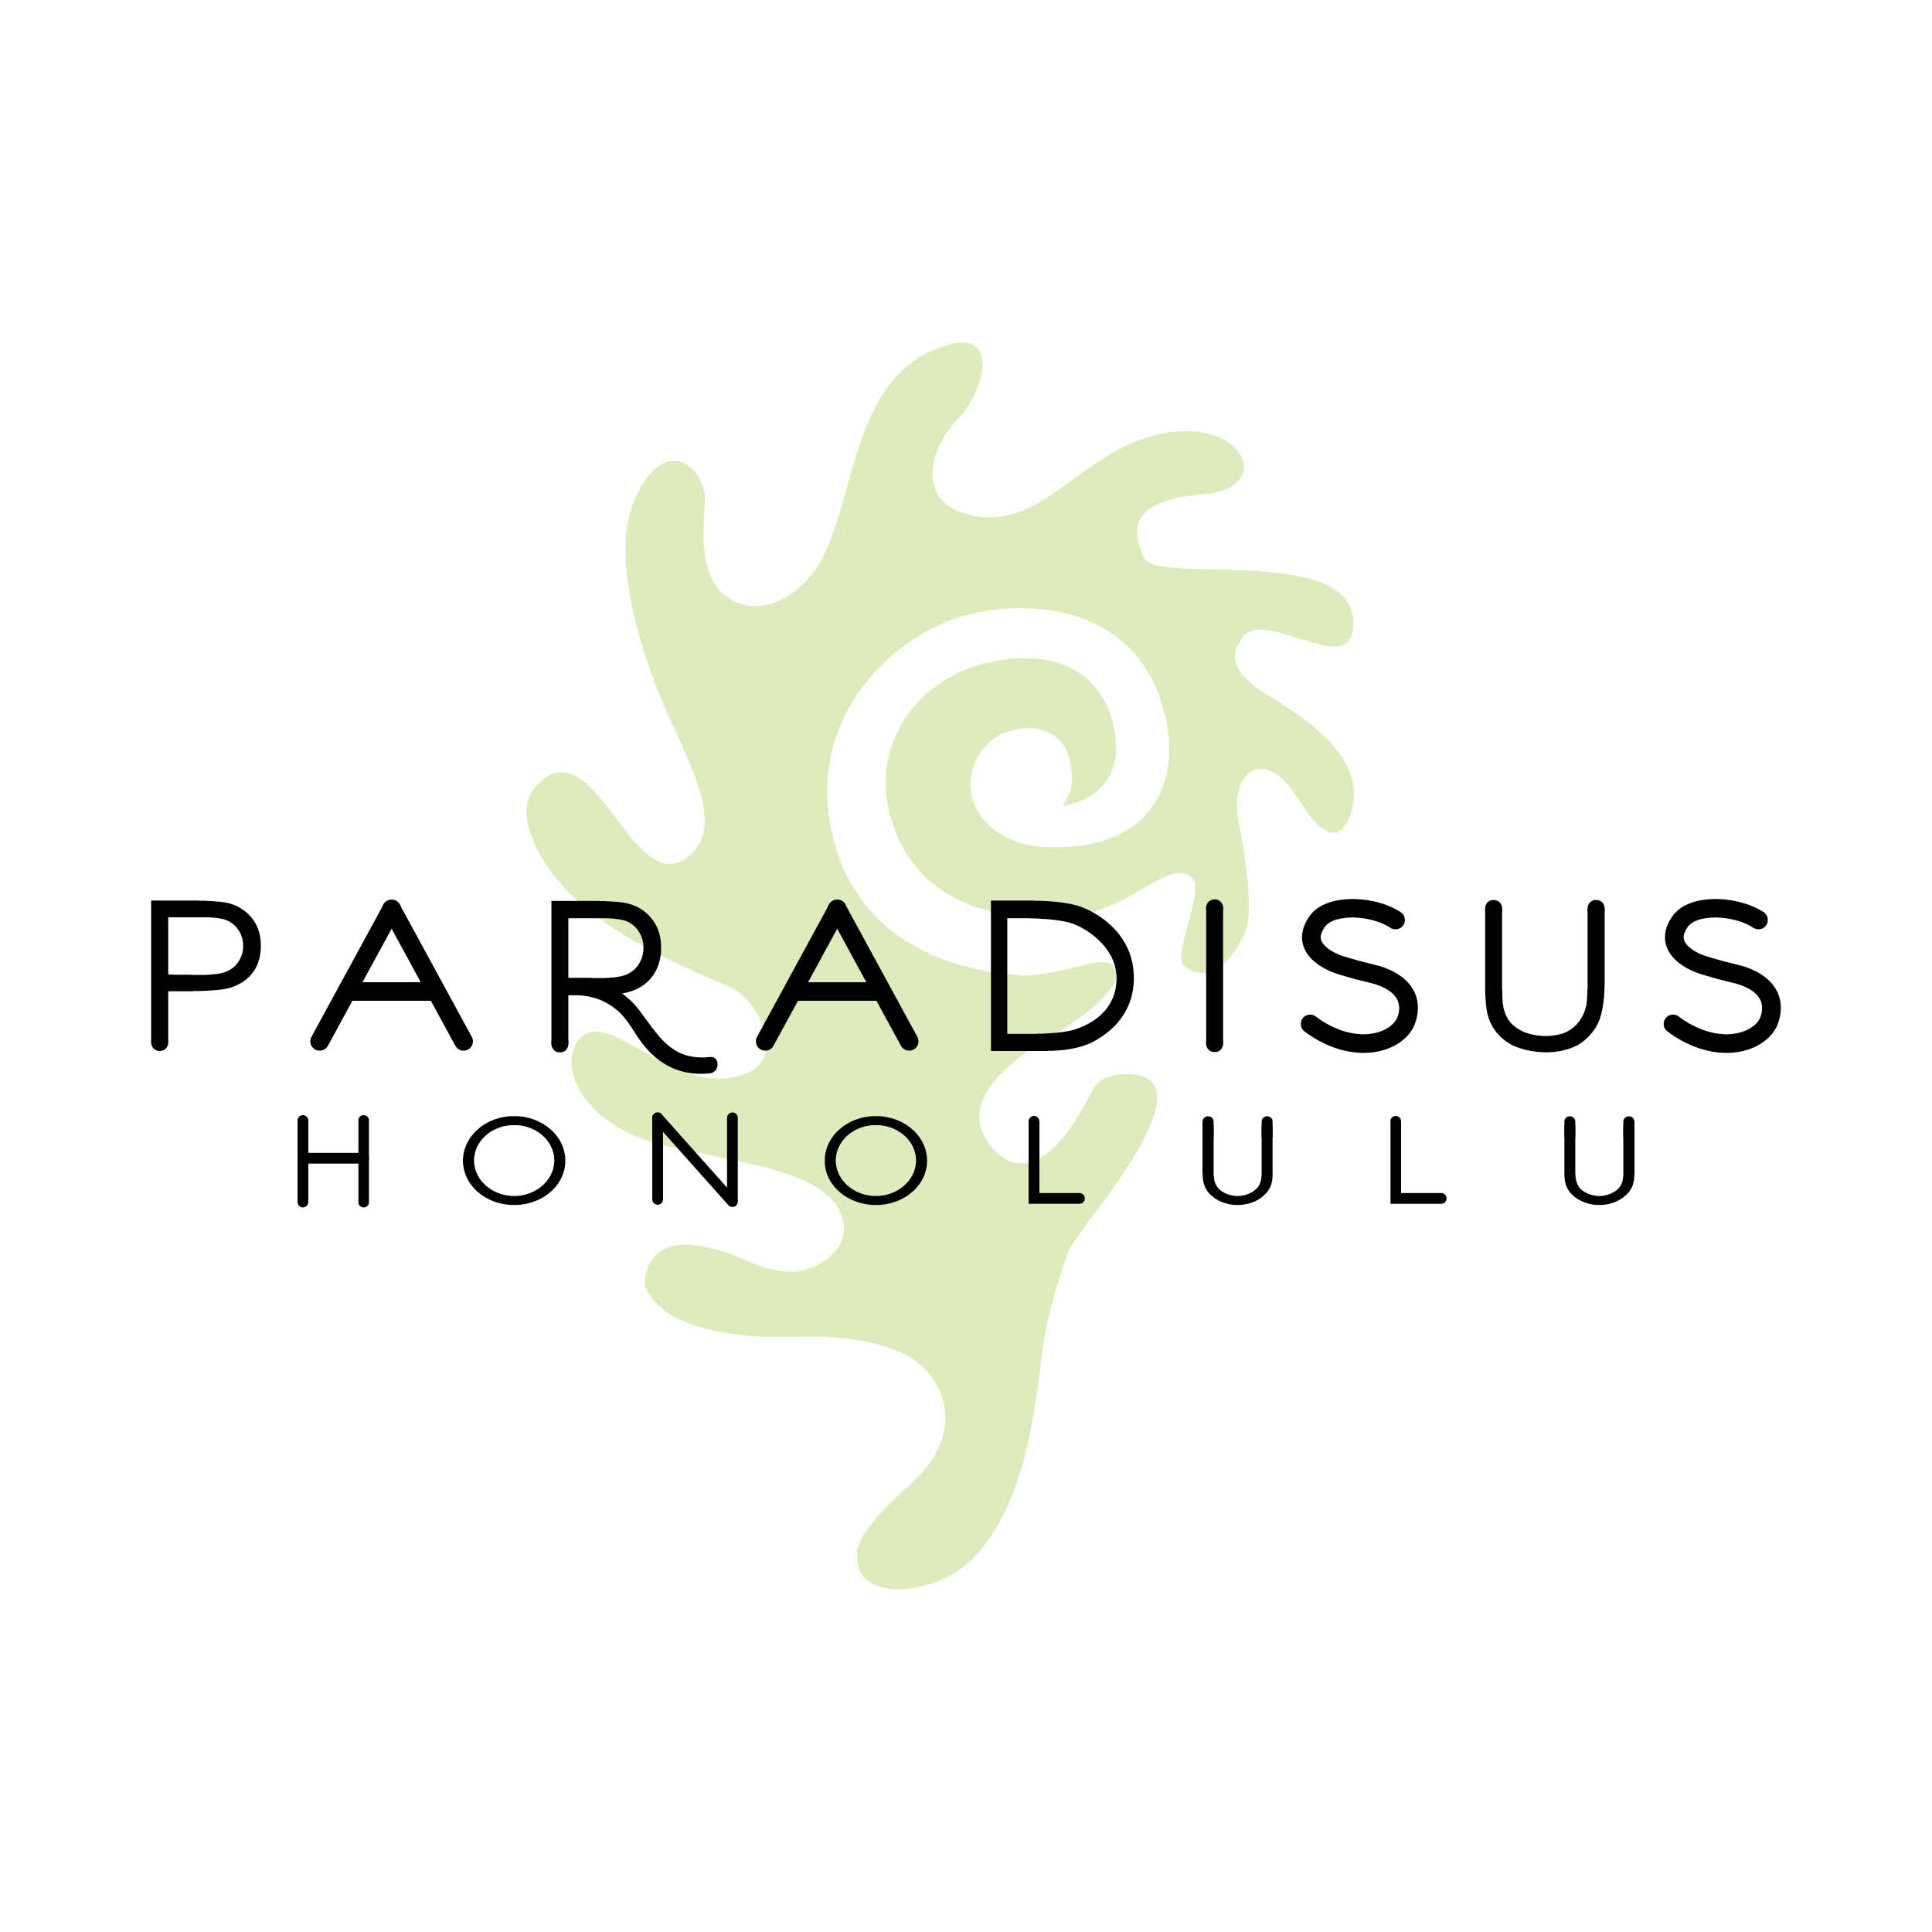 Paradisus.jpg